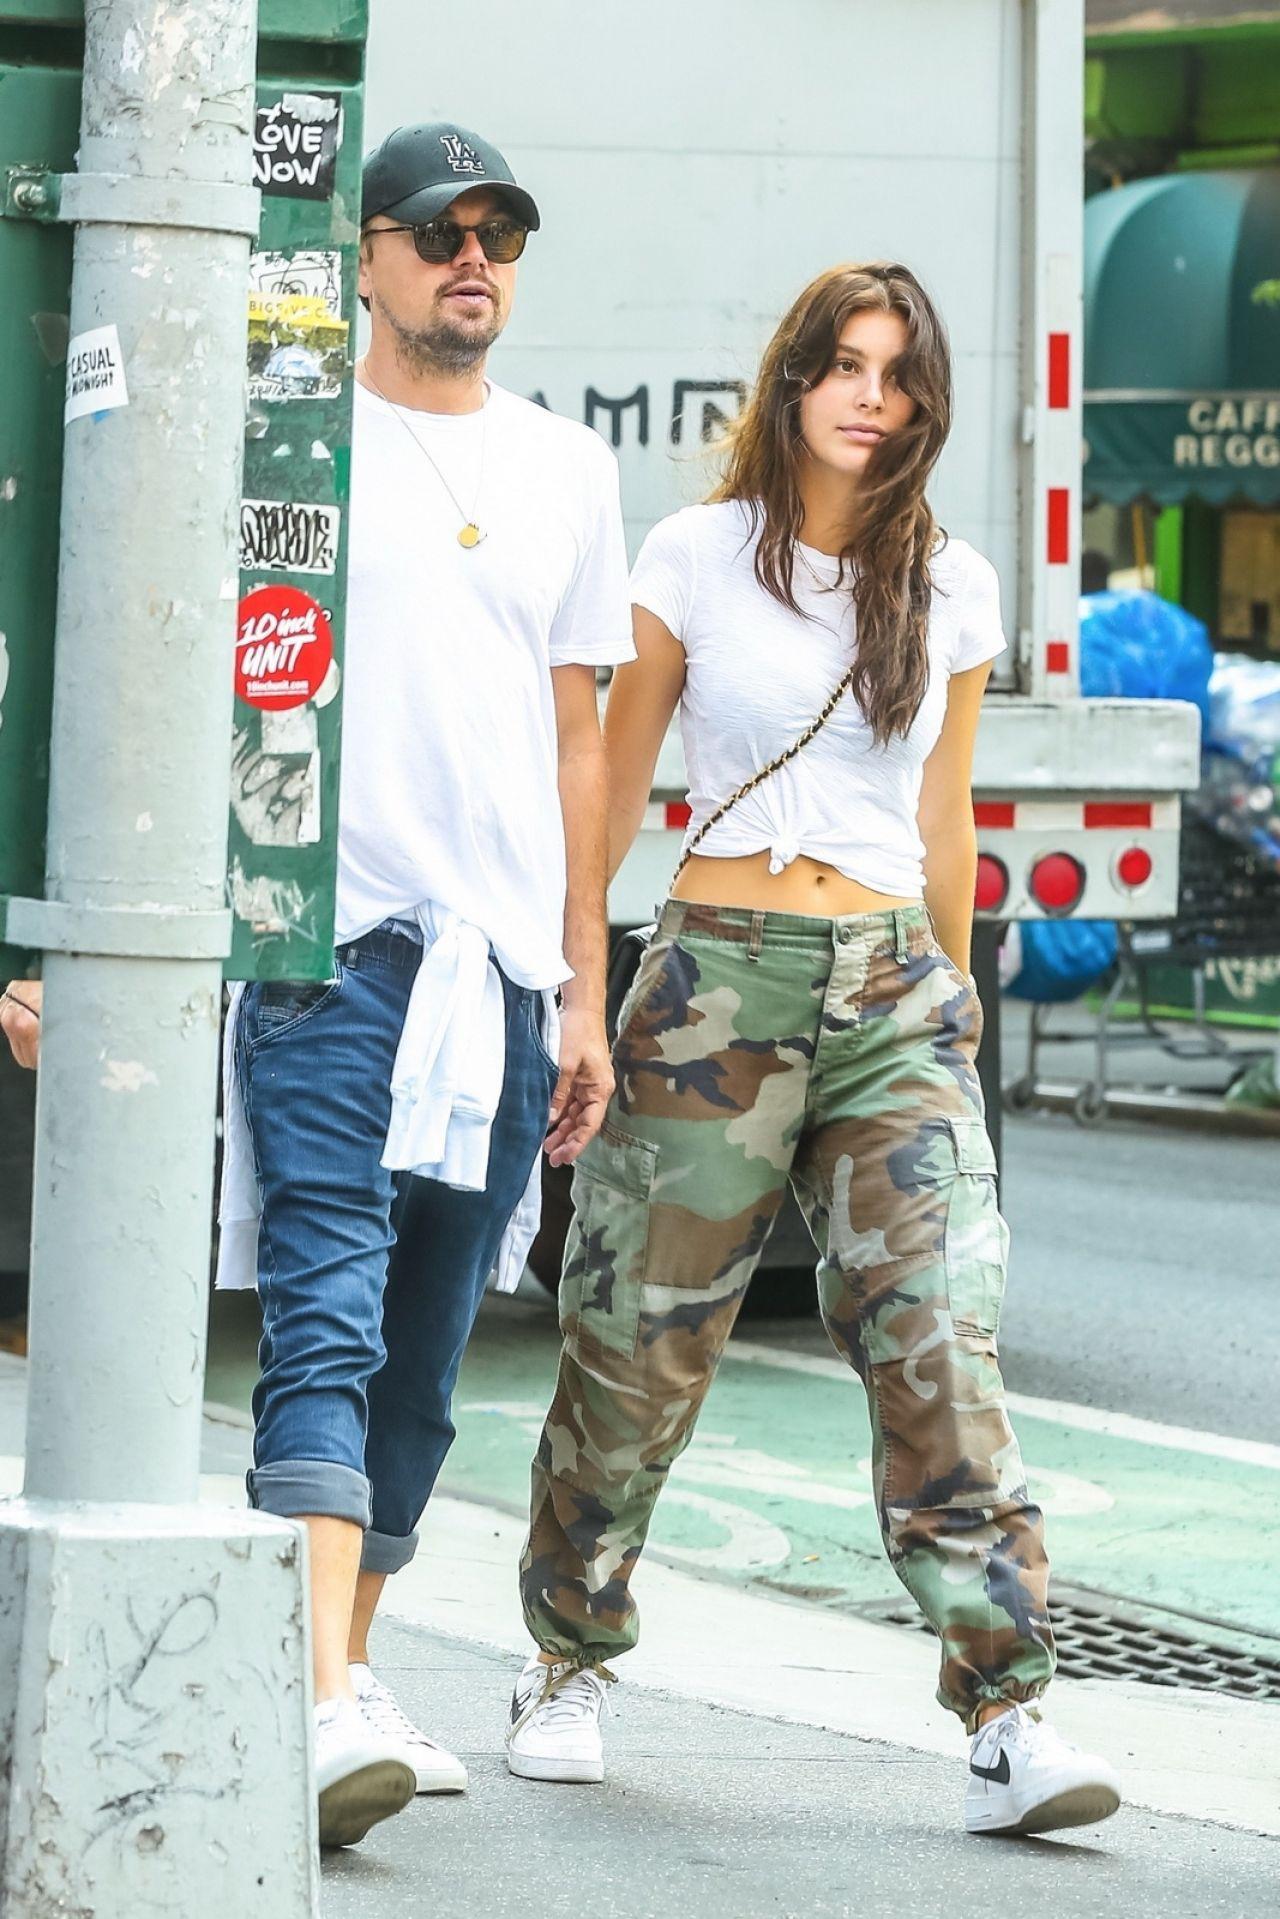 Camila Morrone And Leonardo Dicaprio West Village New